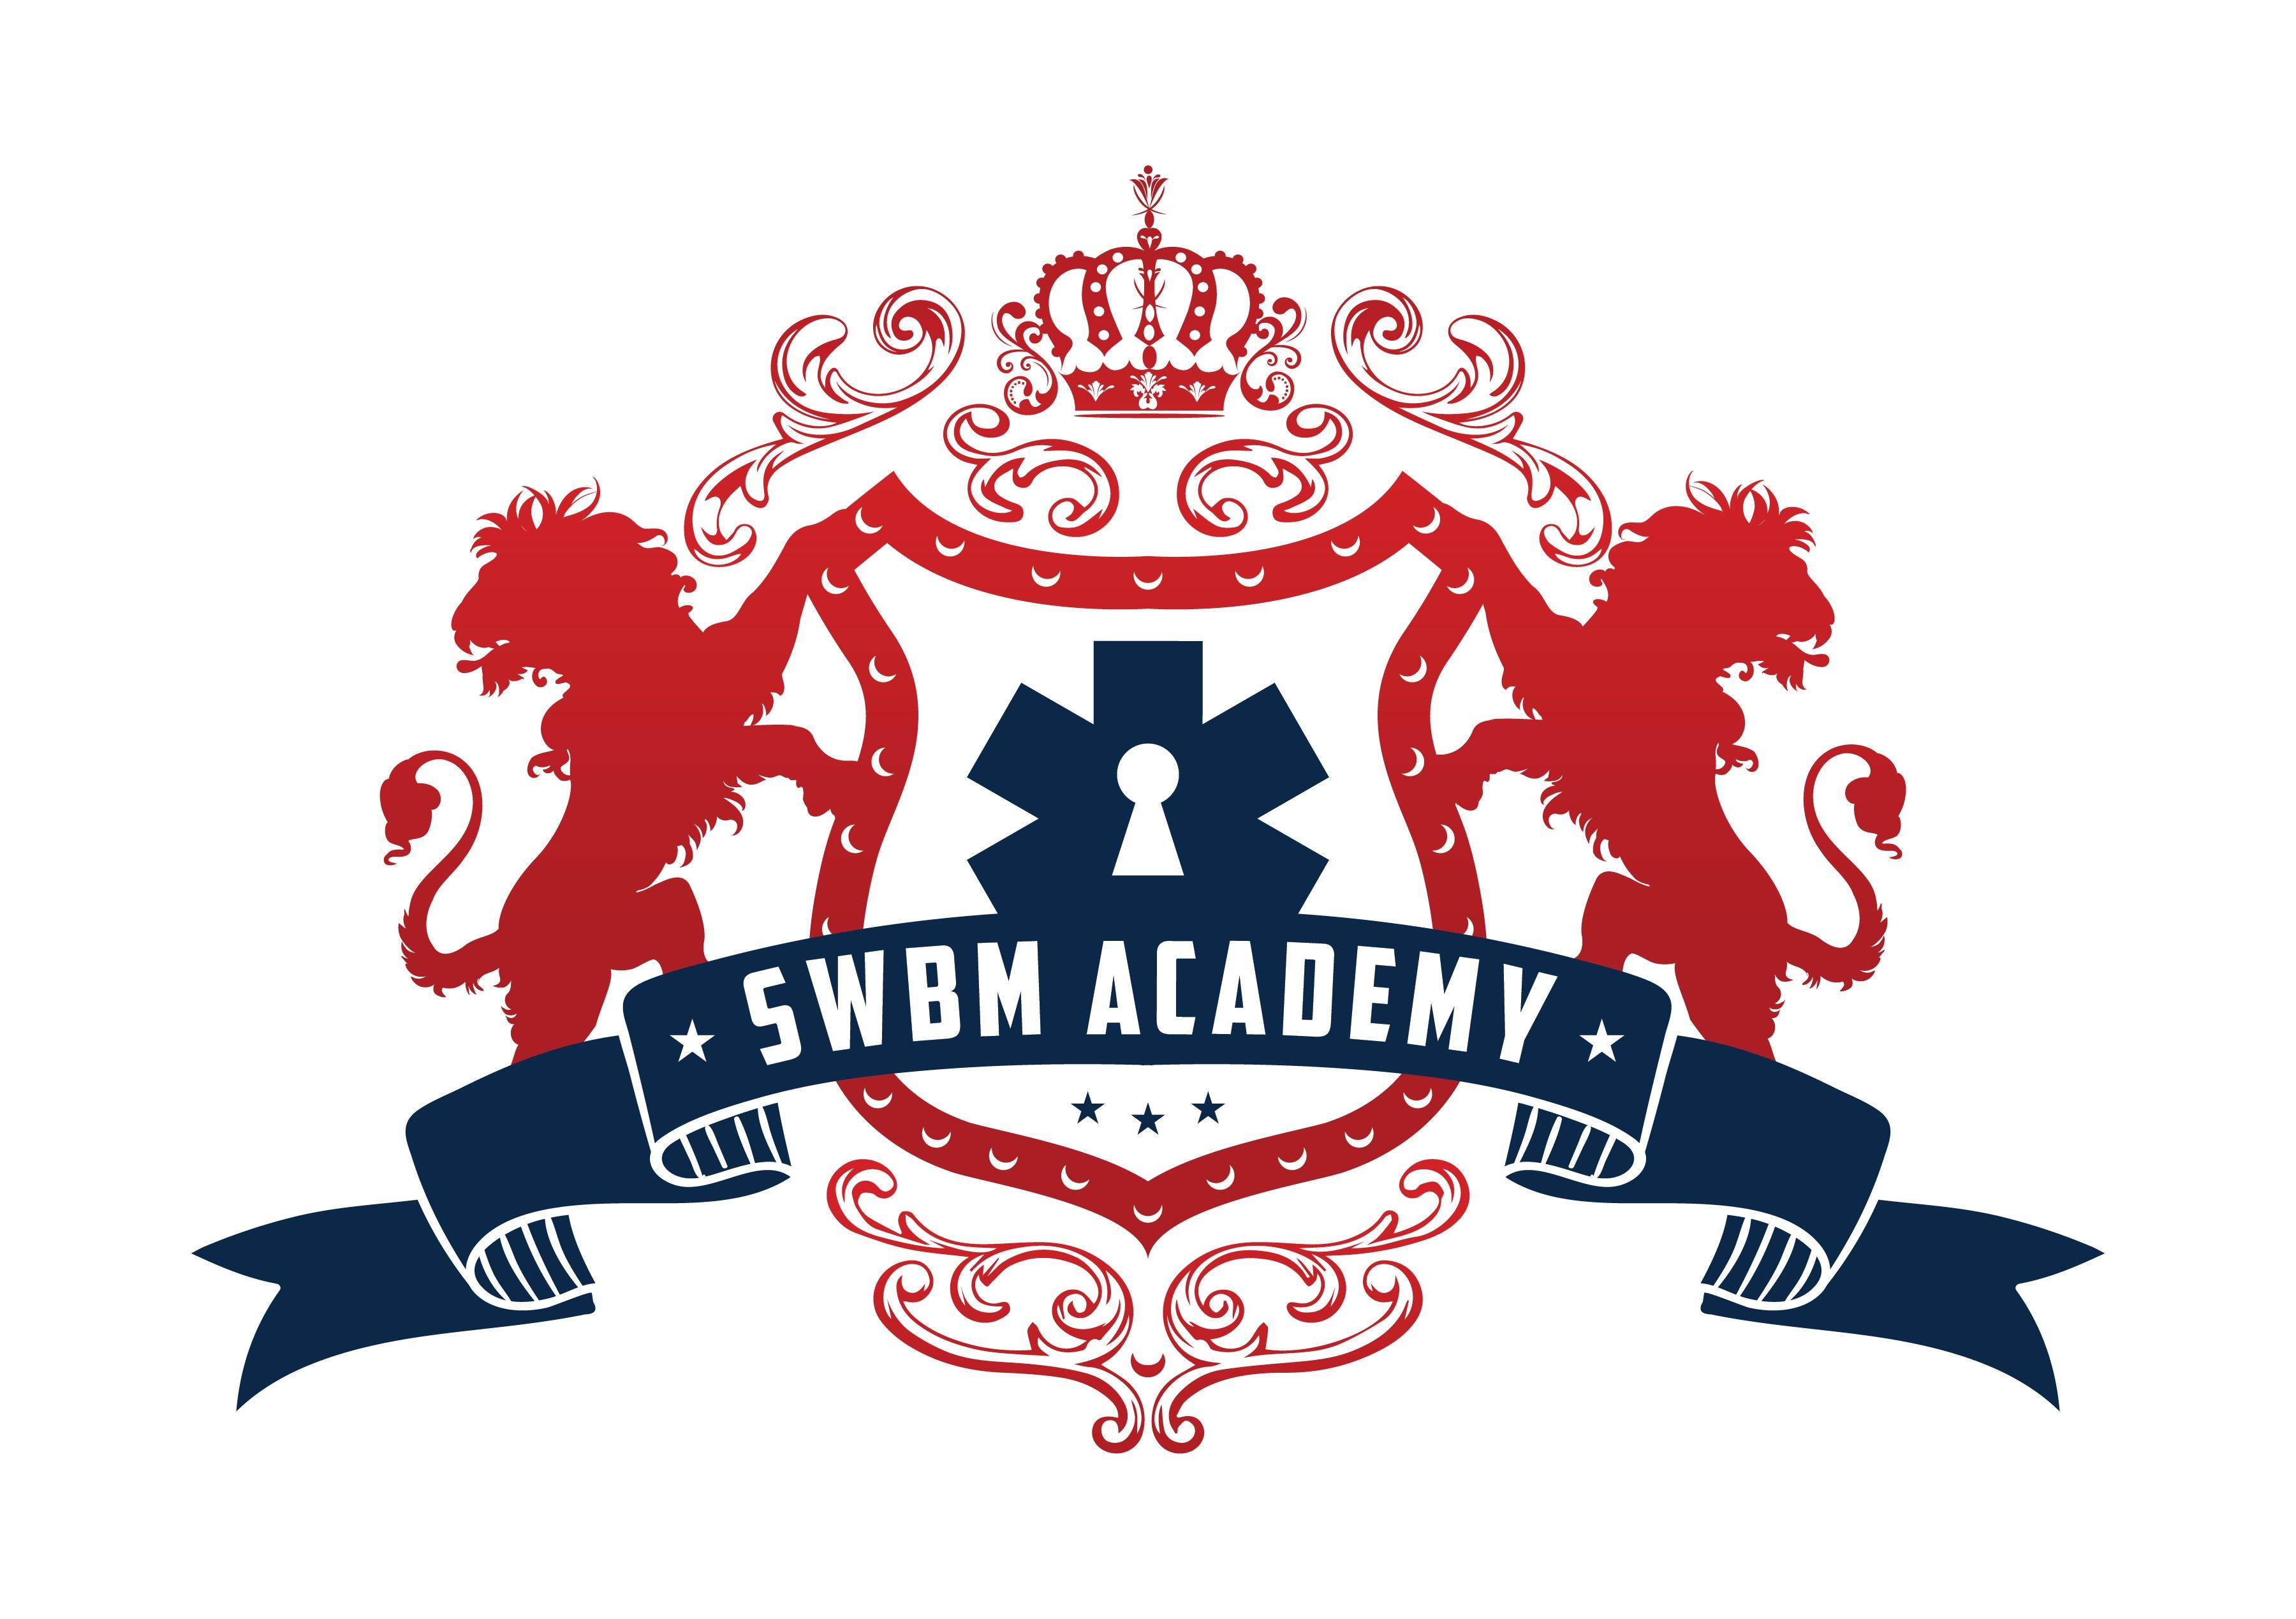 SWBM ACADEMY